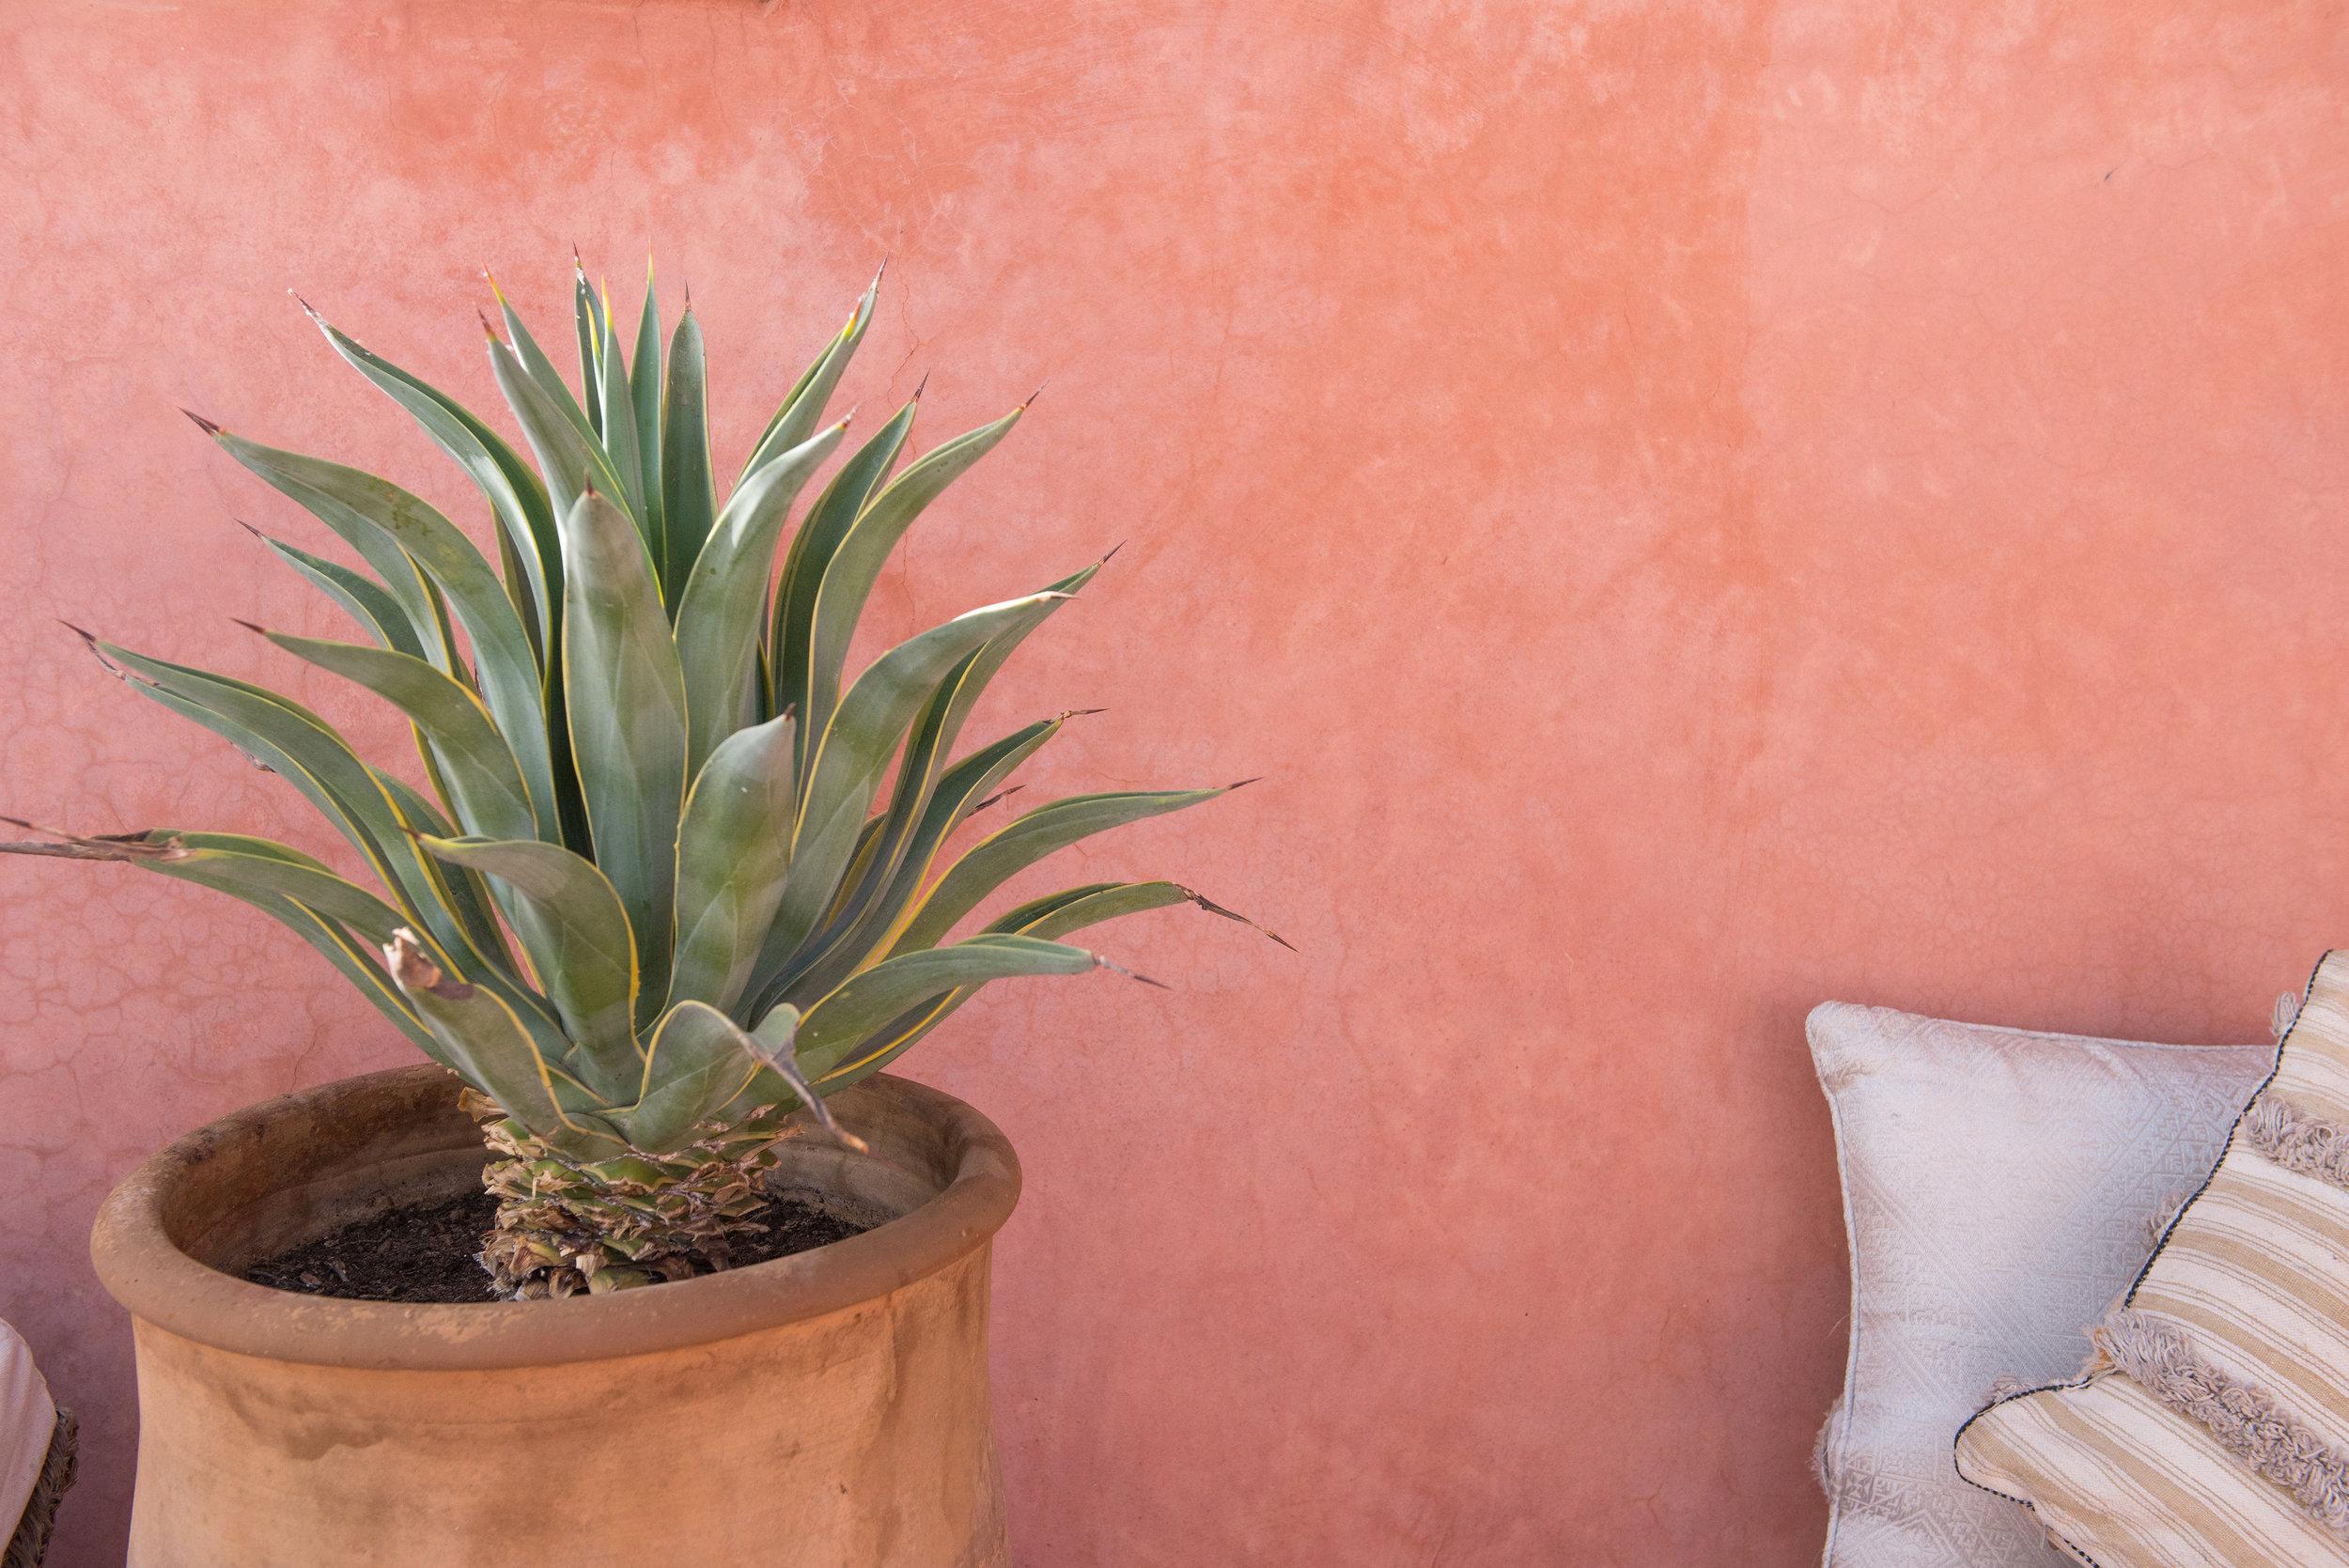 riad-zamzam-marrakech-spa-morocco-luxury-holiday-02